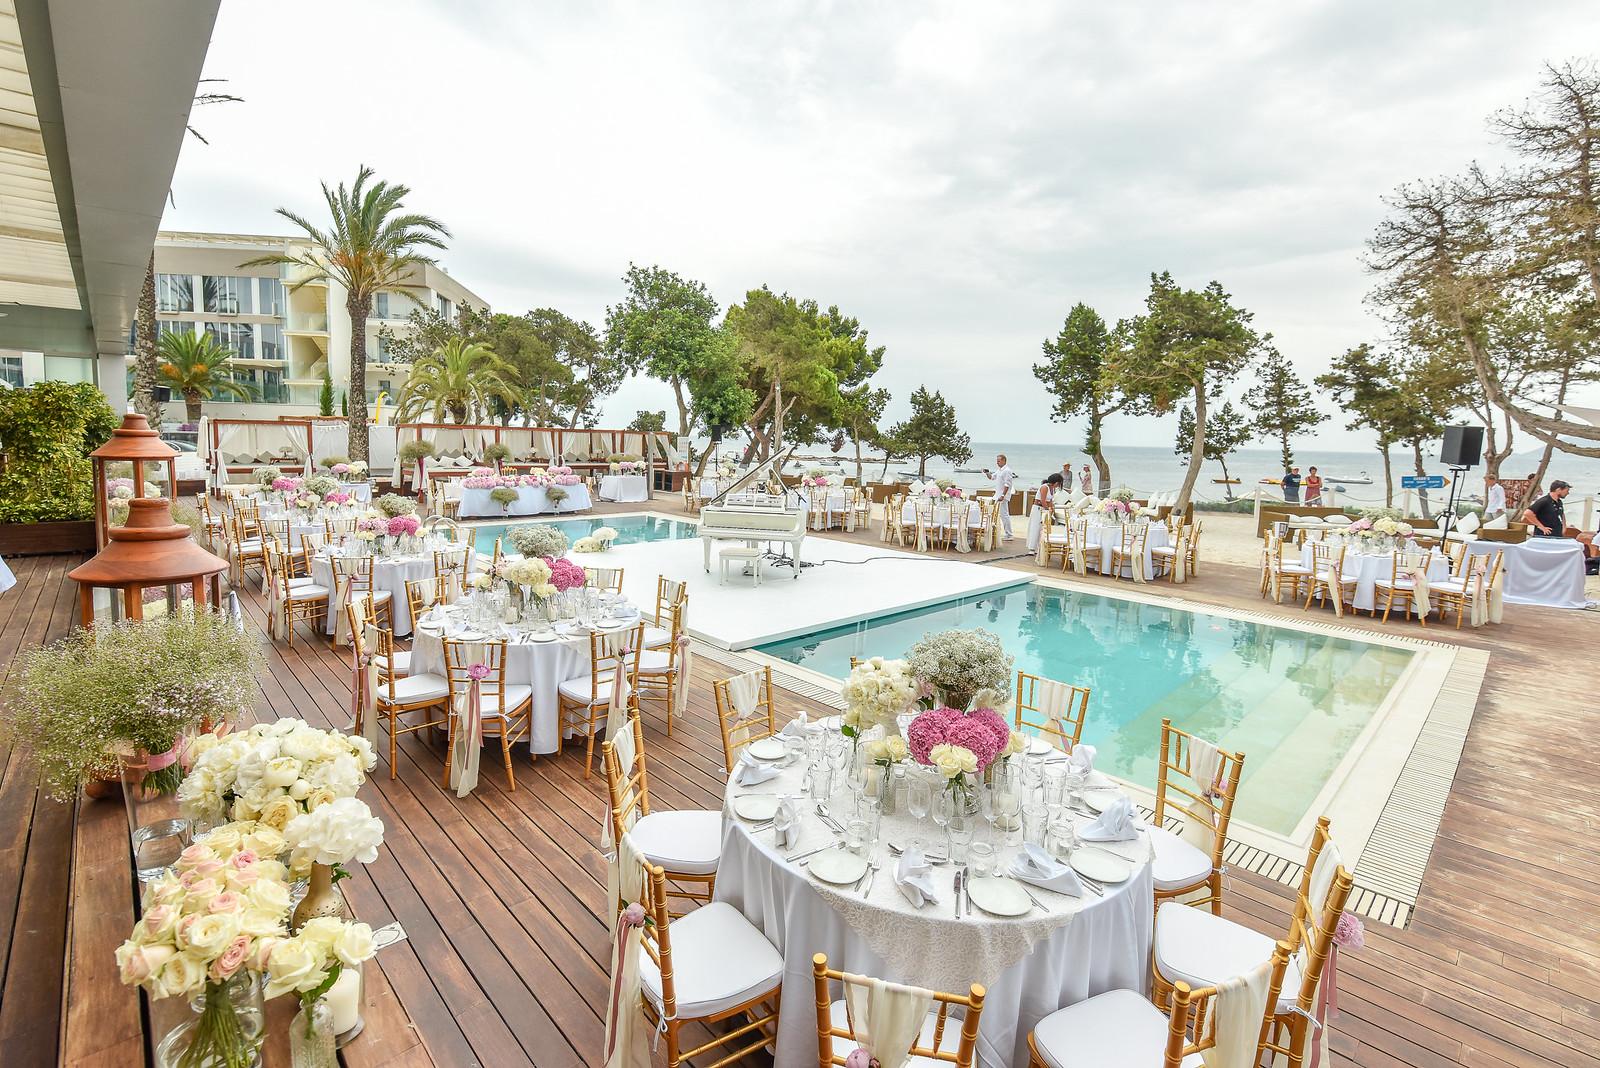 https://www.white-ibiza.com/wp-content/uploads/2020/07/white-ibiza-wedding-venue-nikki-beach-ibiza-2020-02.jpg